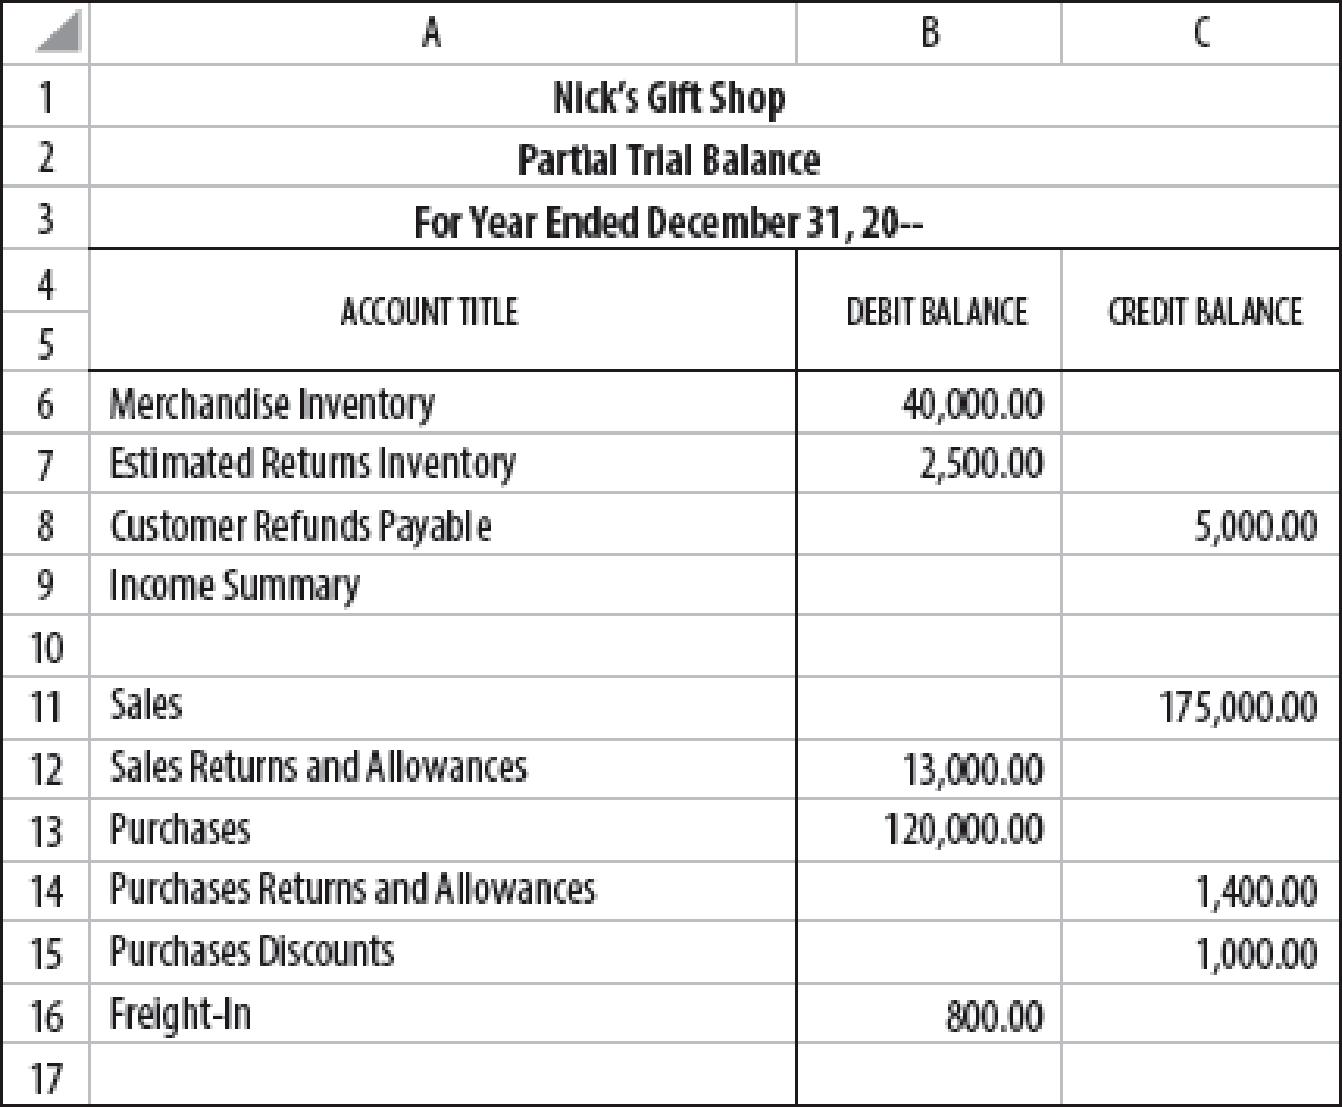 Merchandise Inventory Adjustments Periodic Inventory